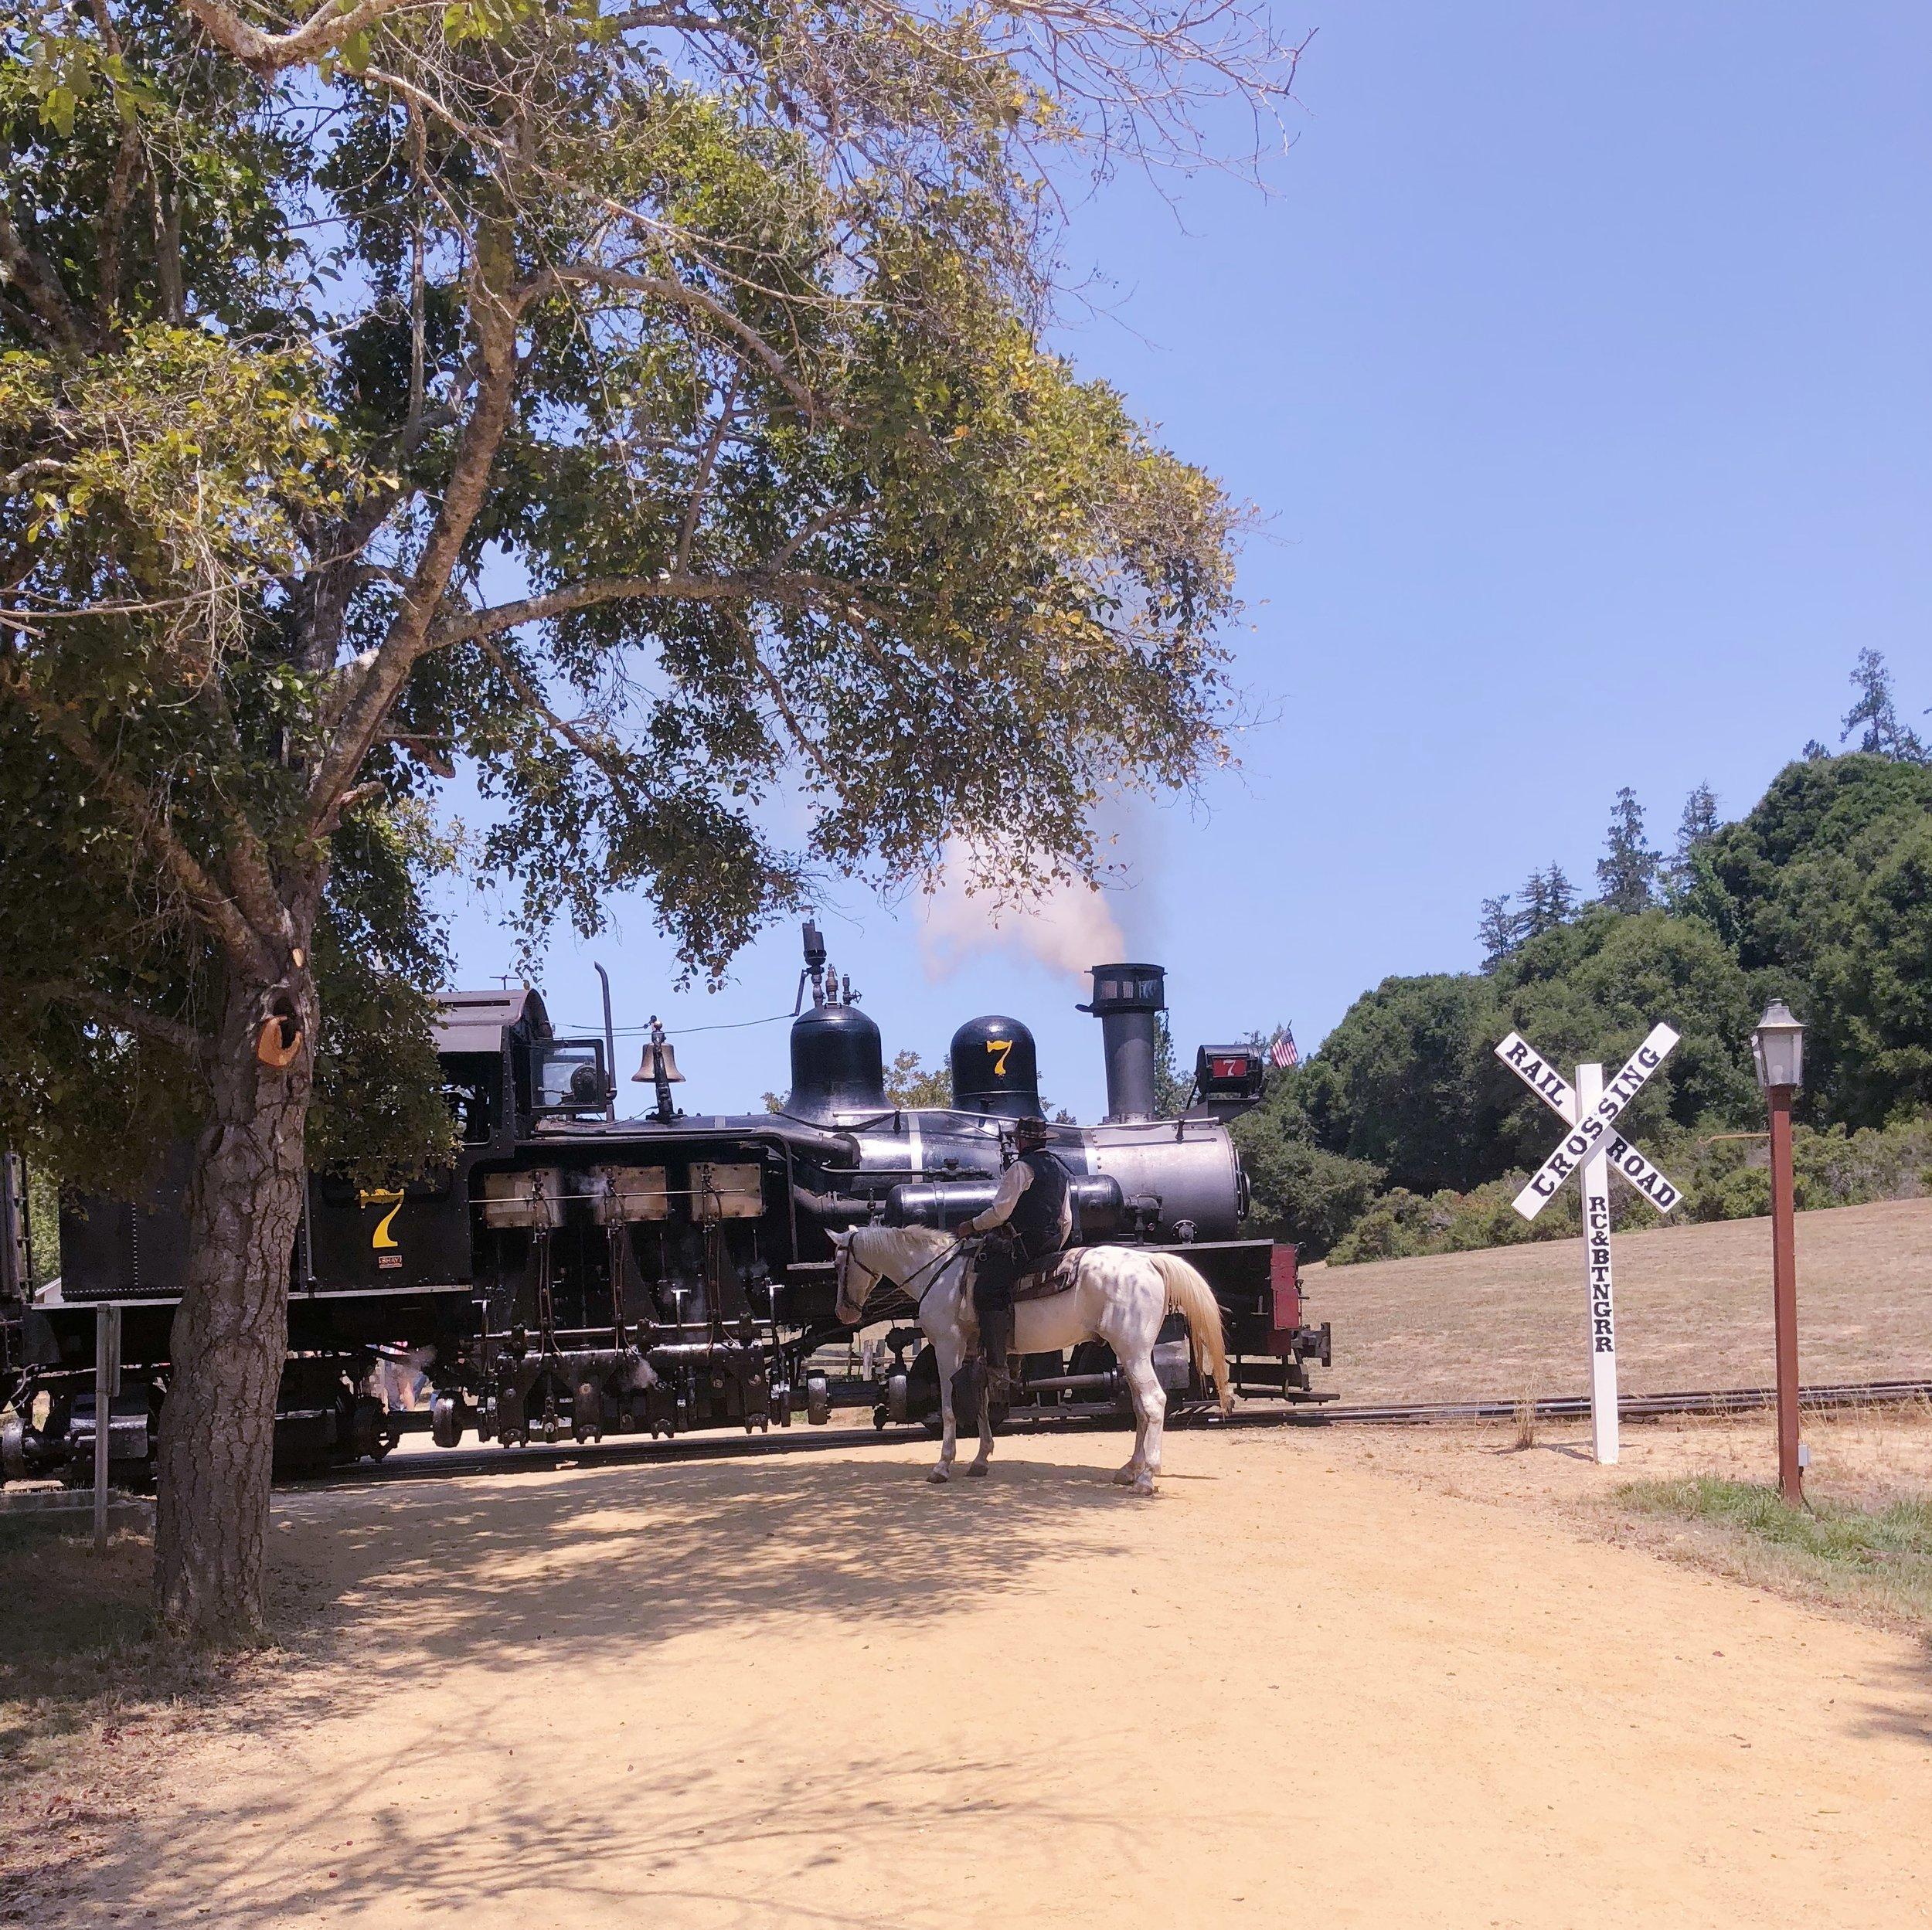 Roaring Camp Railroads Felton Sheriff